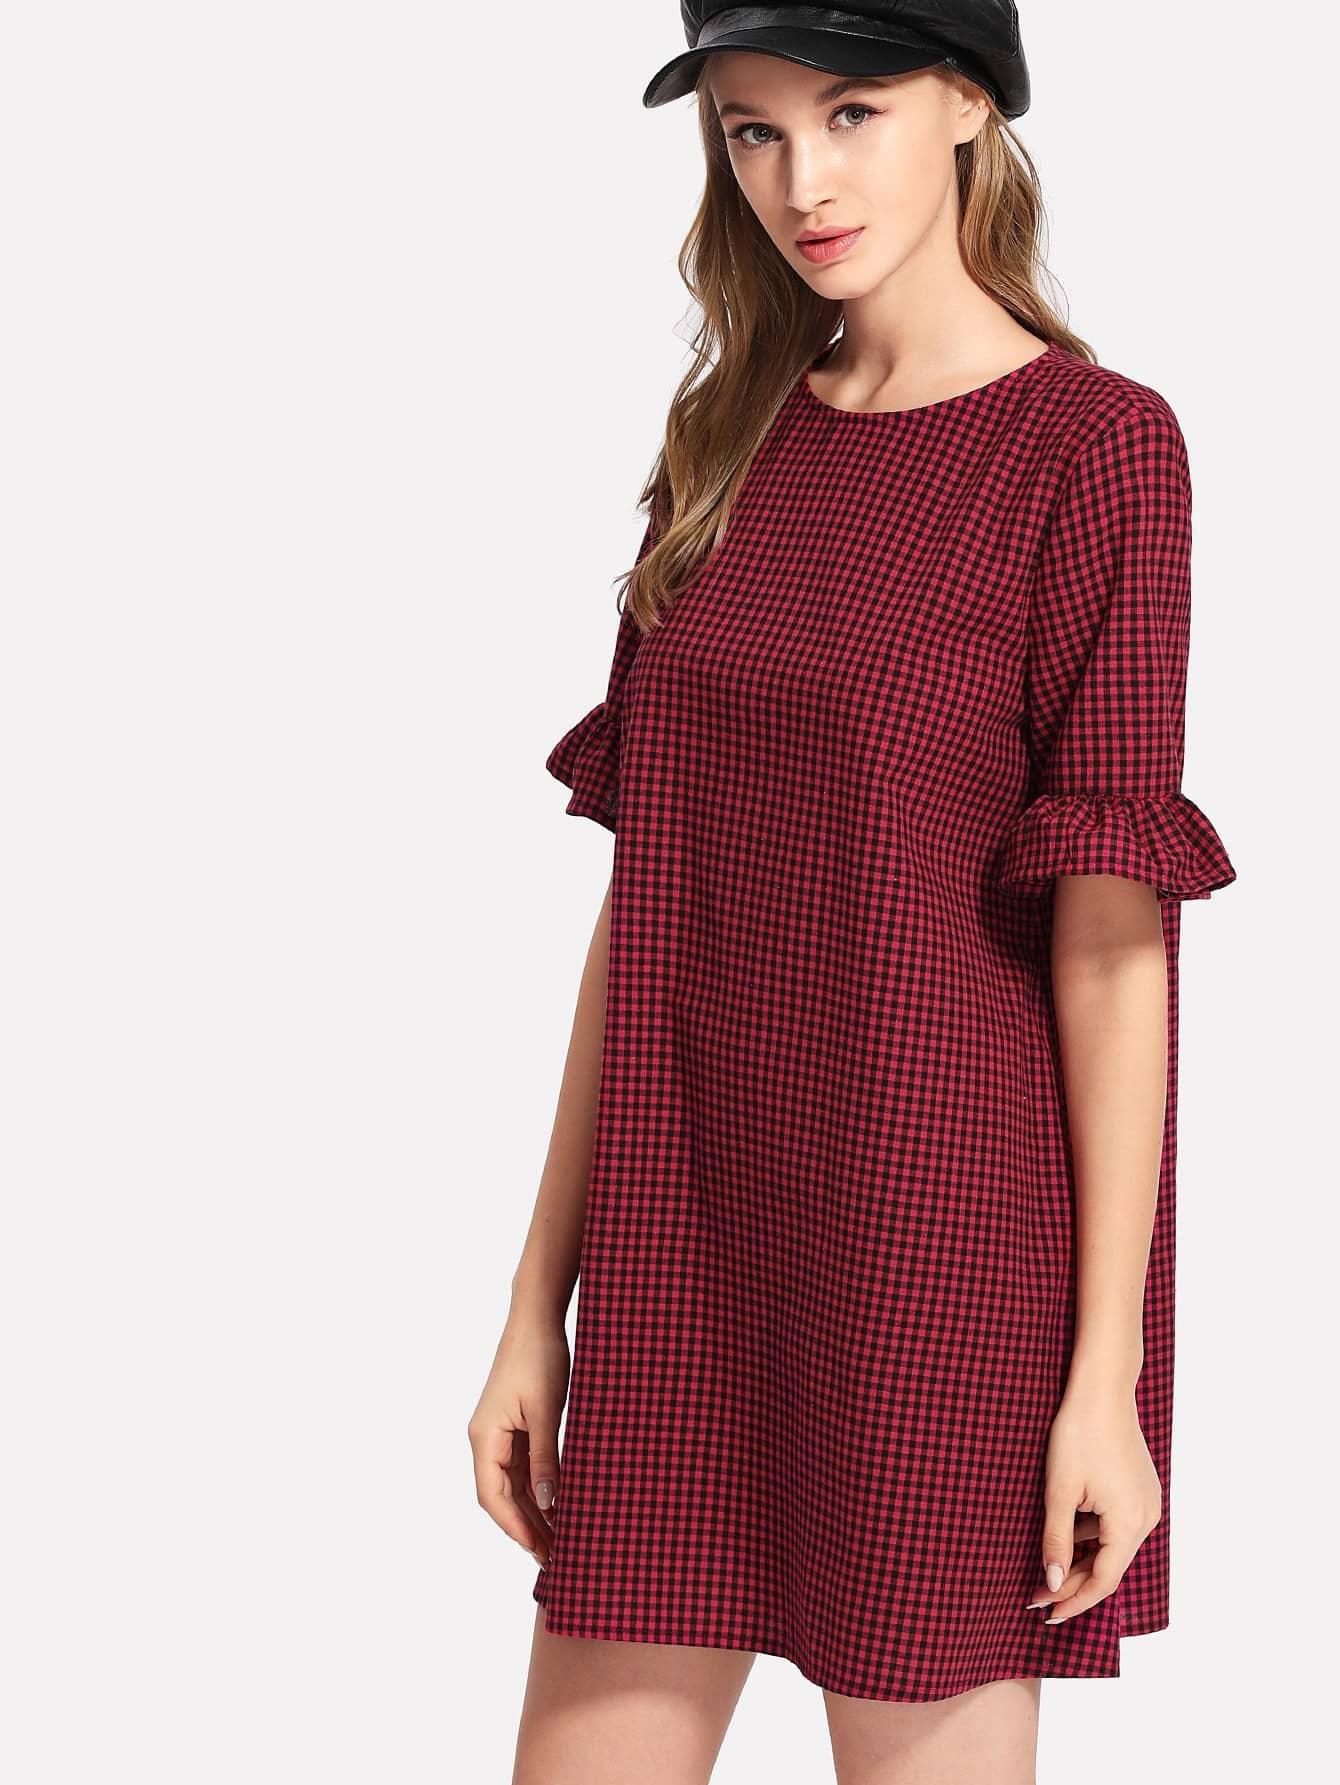 Ruffle Sleeve Gingham Dress raglan sleeve smock gingham dress